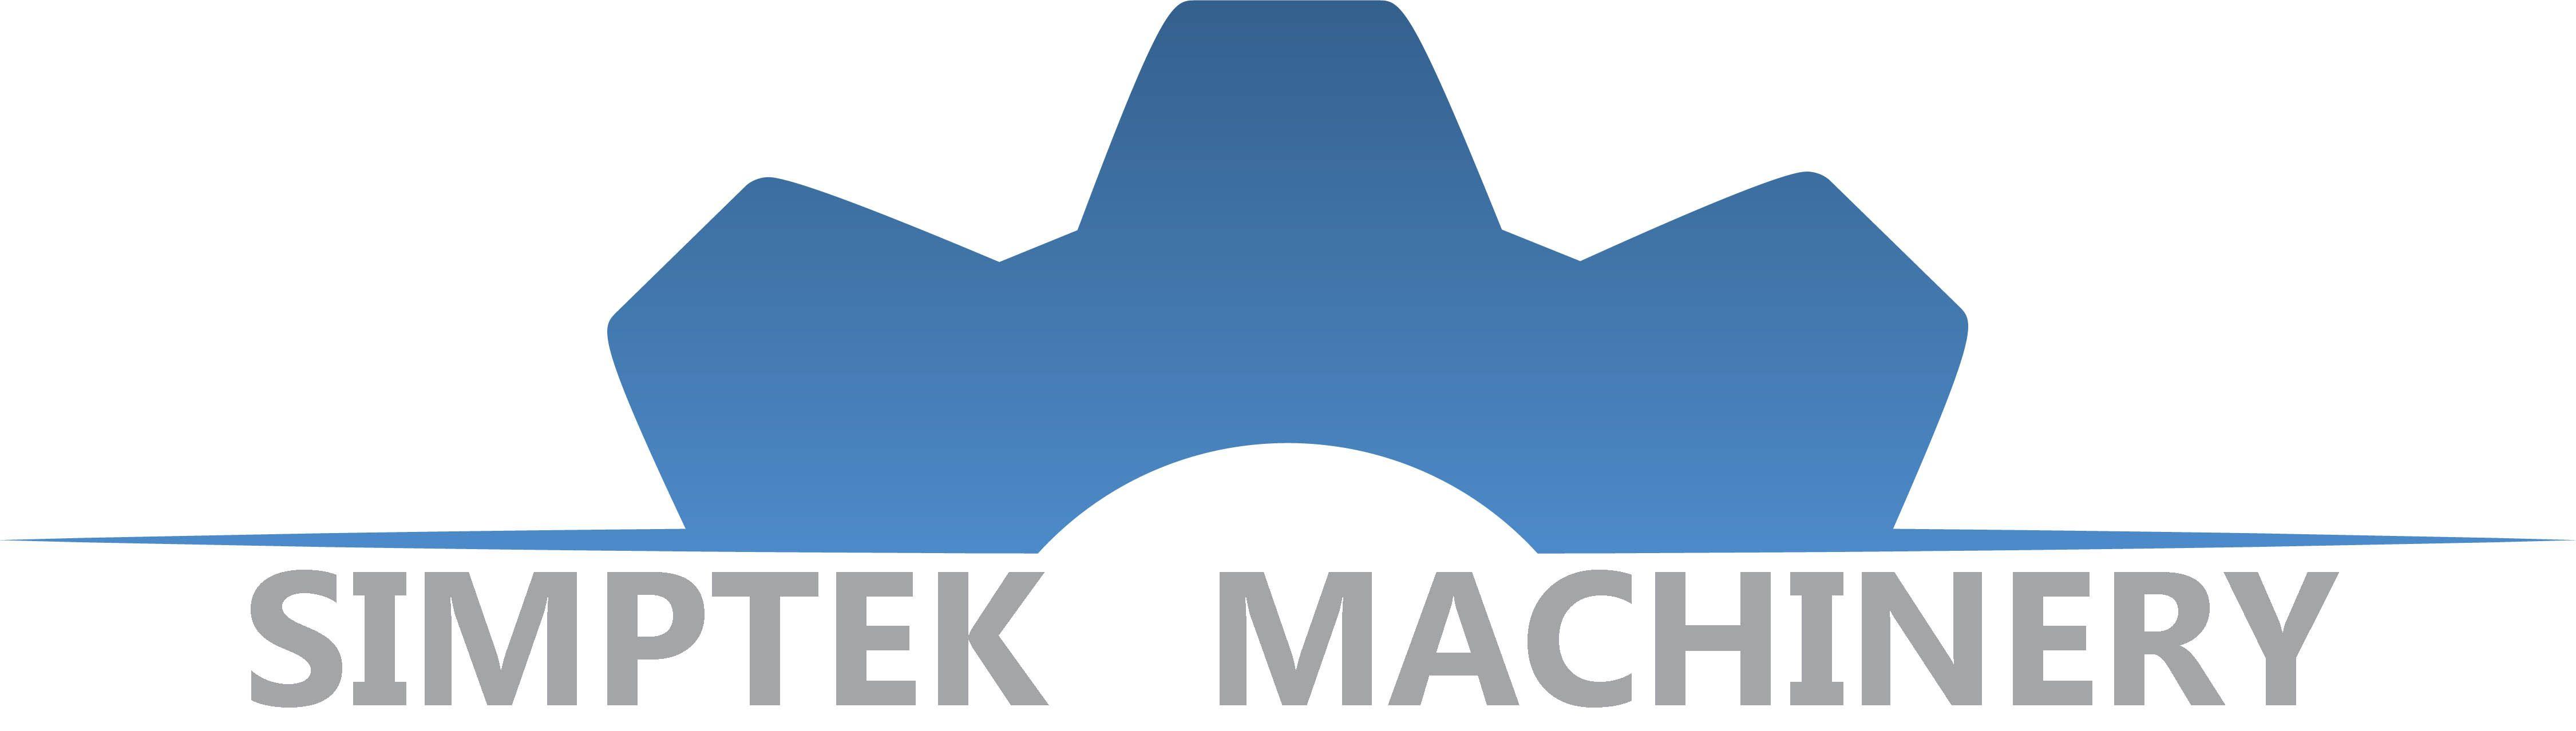 Simptek Machinery Ltd